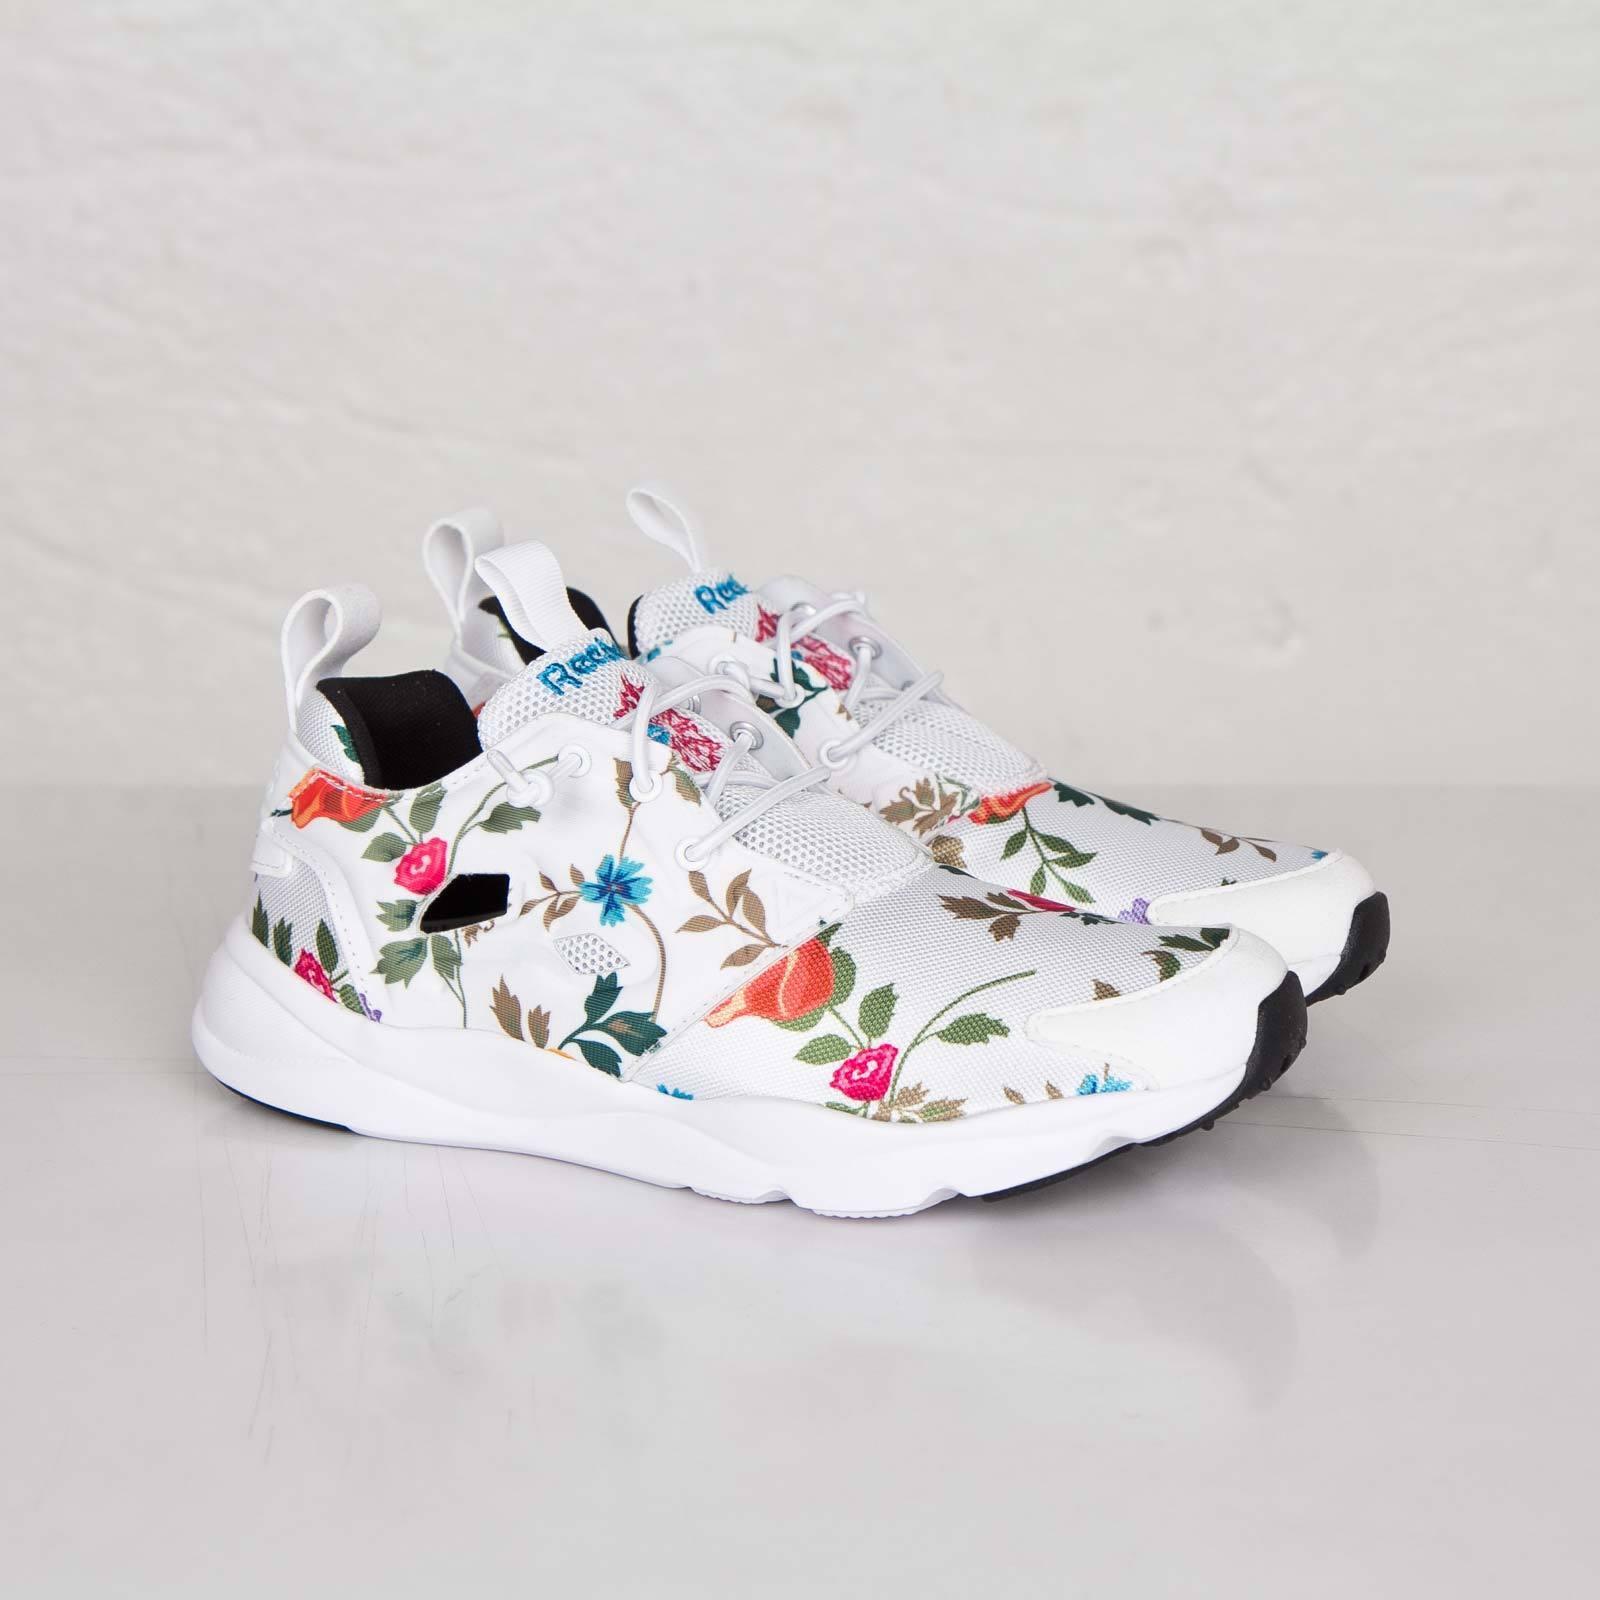 shoes N 42,5 UK 8,5 REEBOK FURYLITE SR ART. V63575 COL. BIANCO FIORI